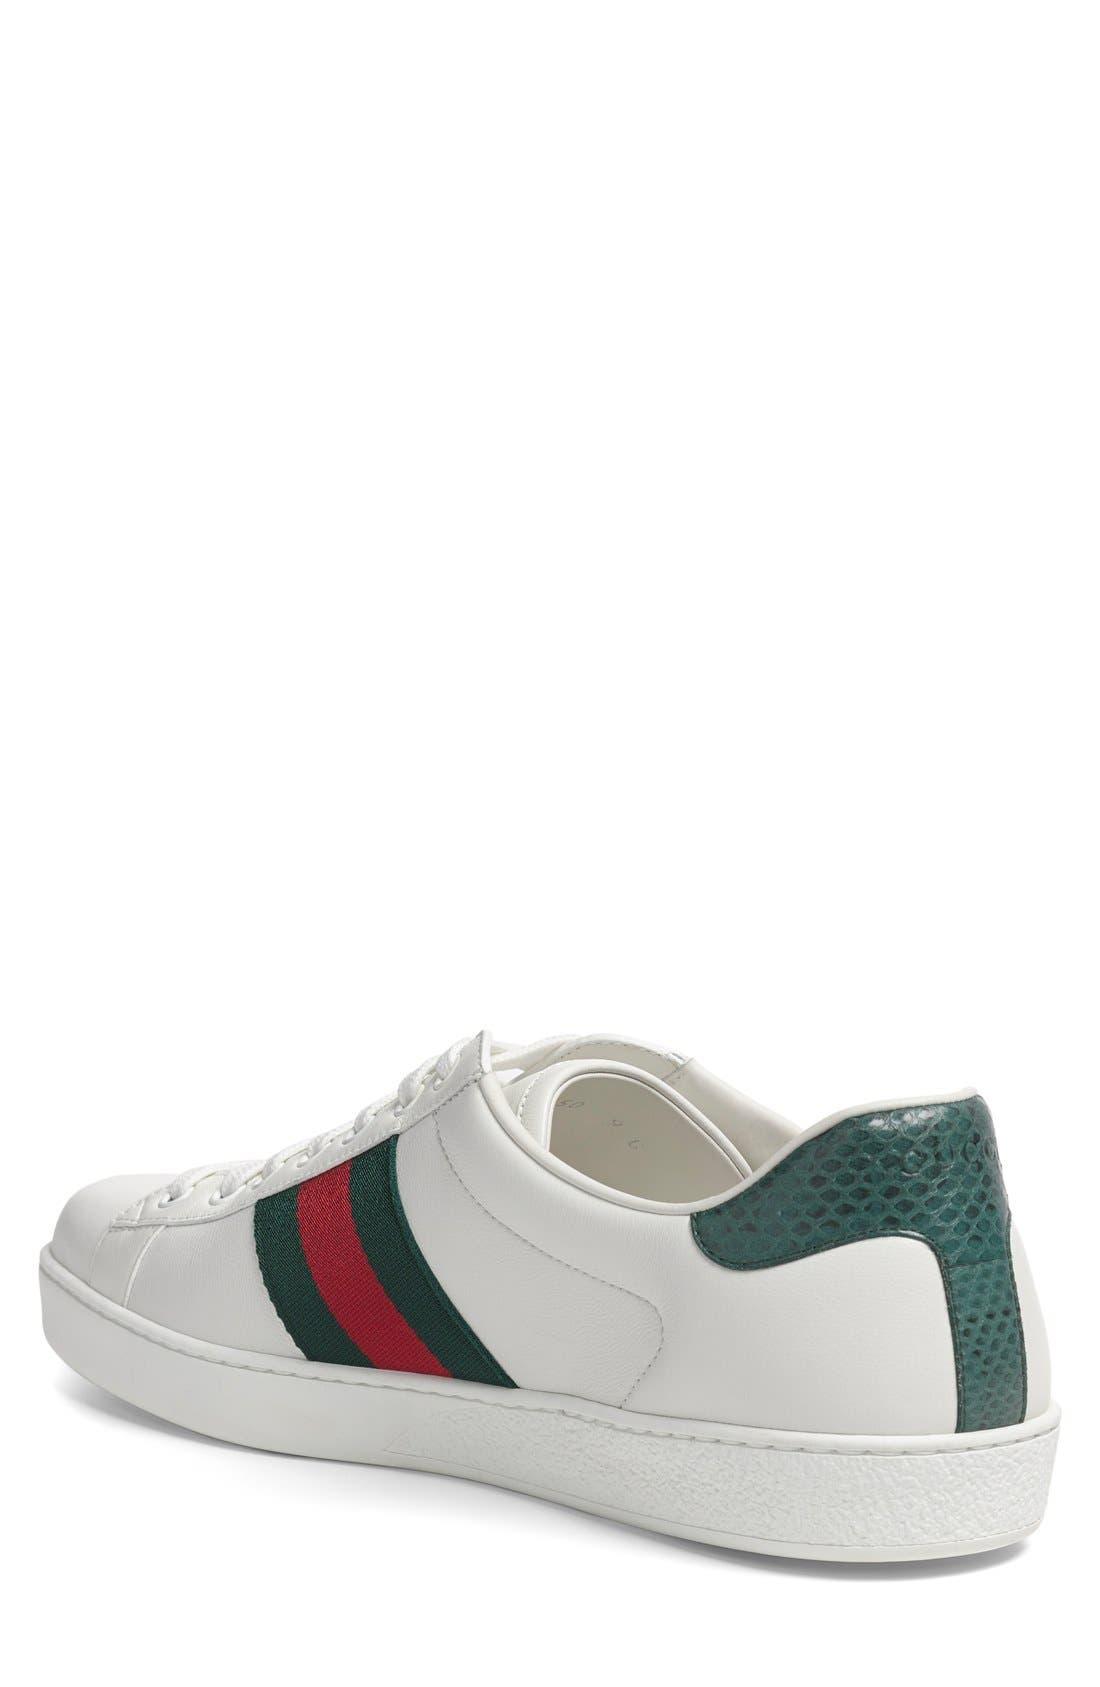 Alternate Image 2  - Gucci New Ace Sneaker (Men)